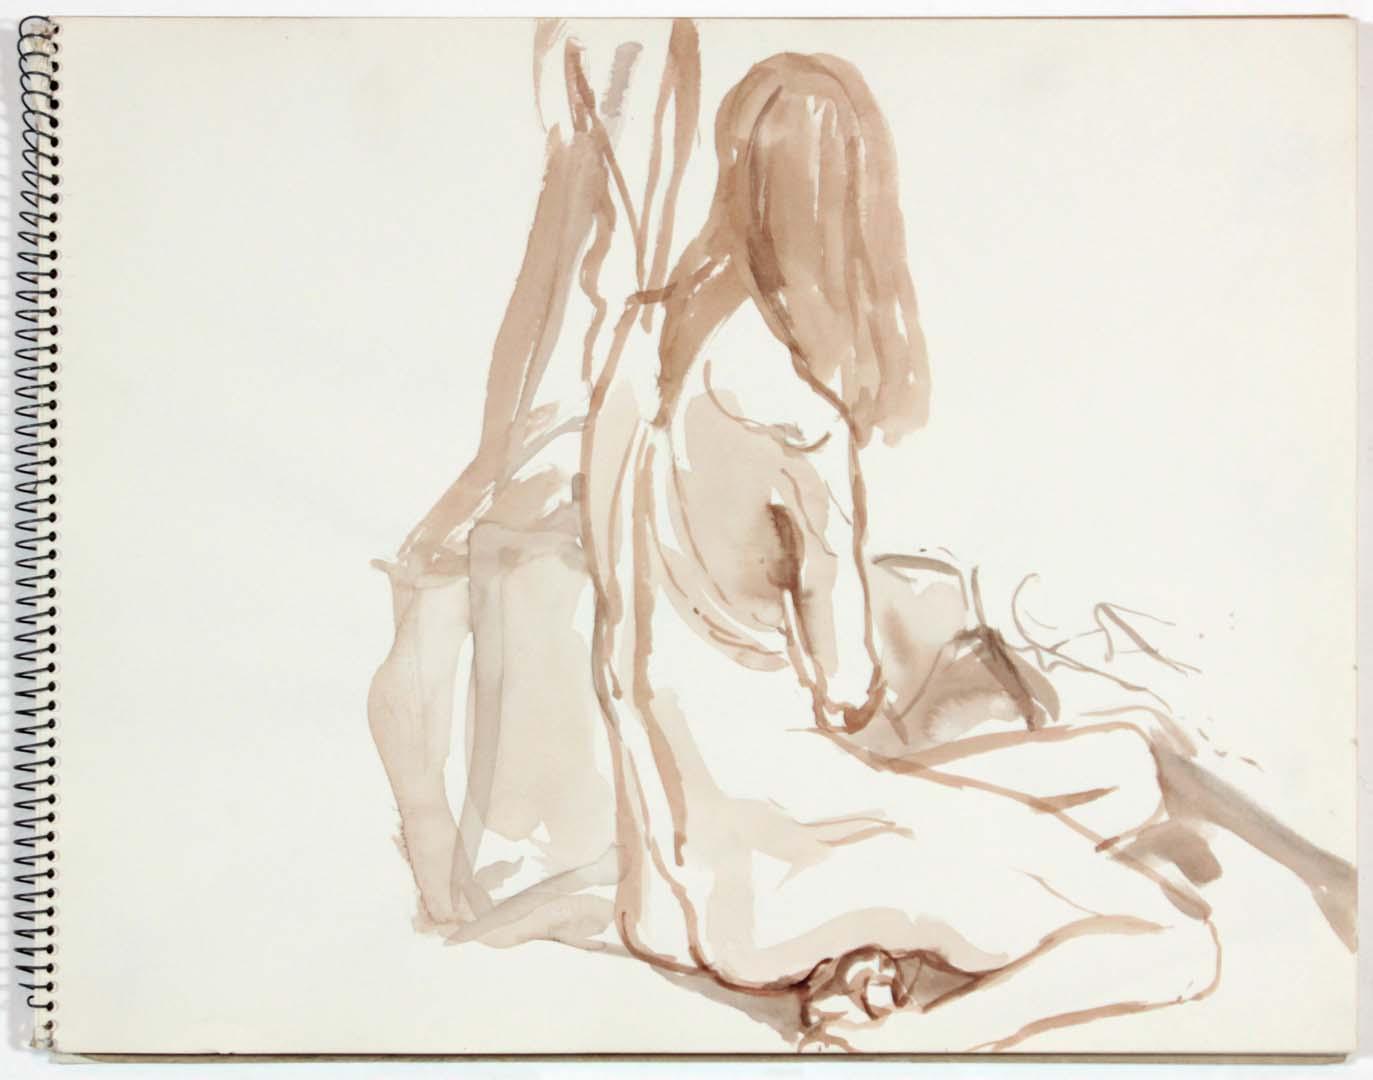 1961 NT (SB #6) Wash on Paper 11 x 14